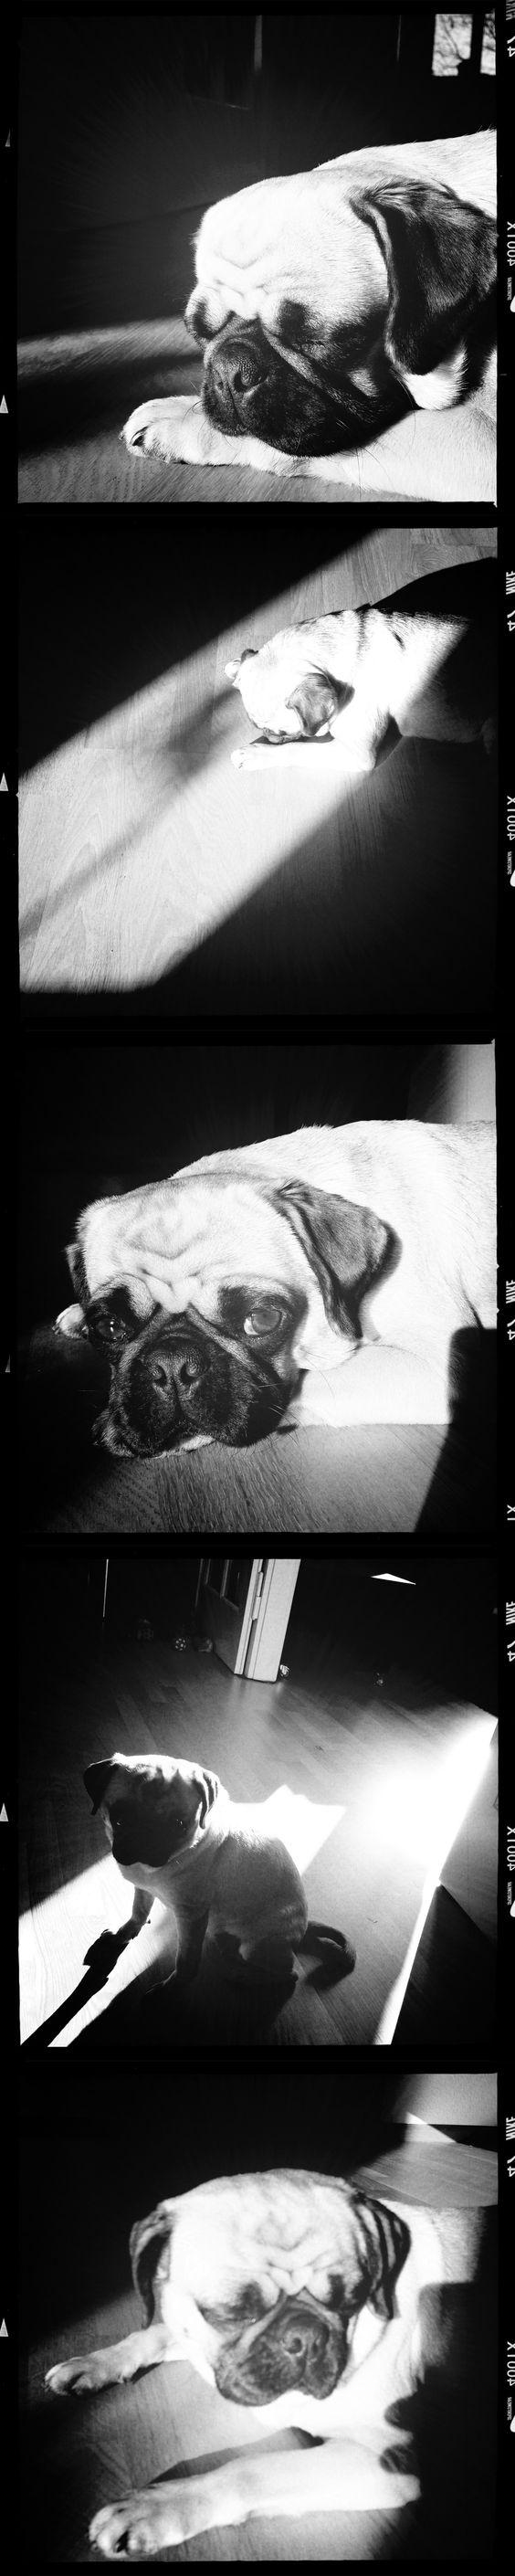 Monochrome Lola #Pug